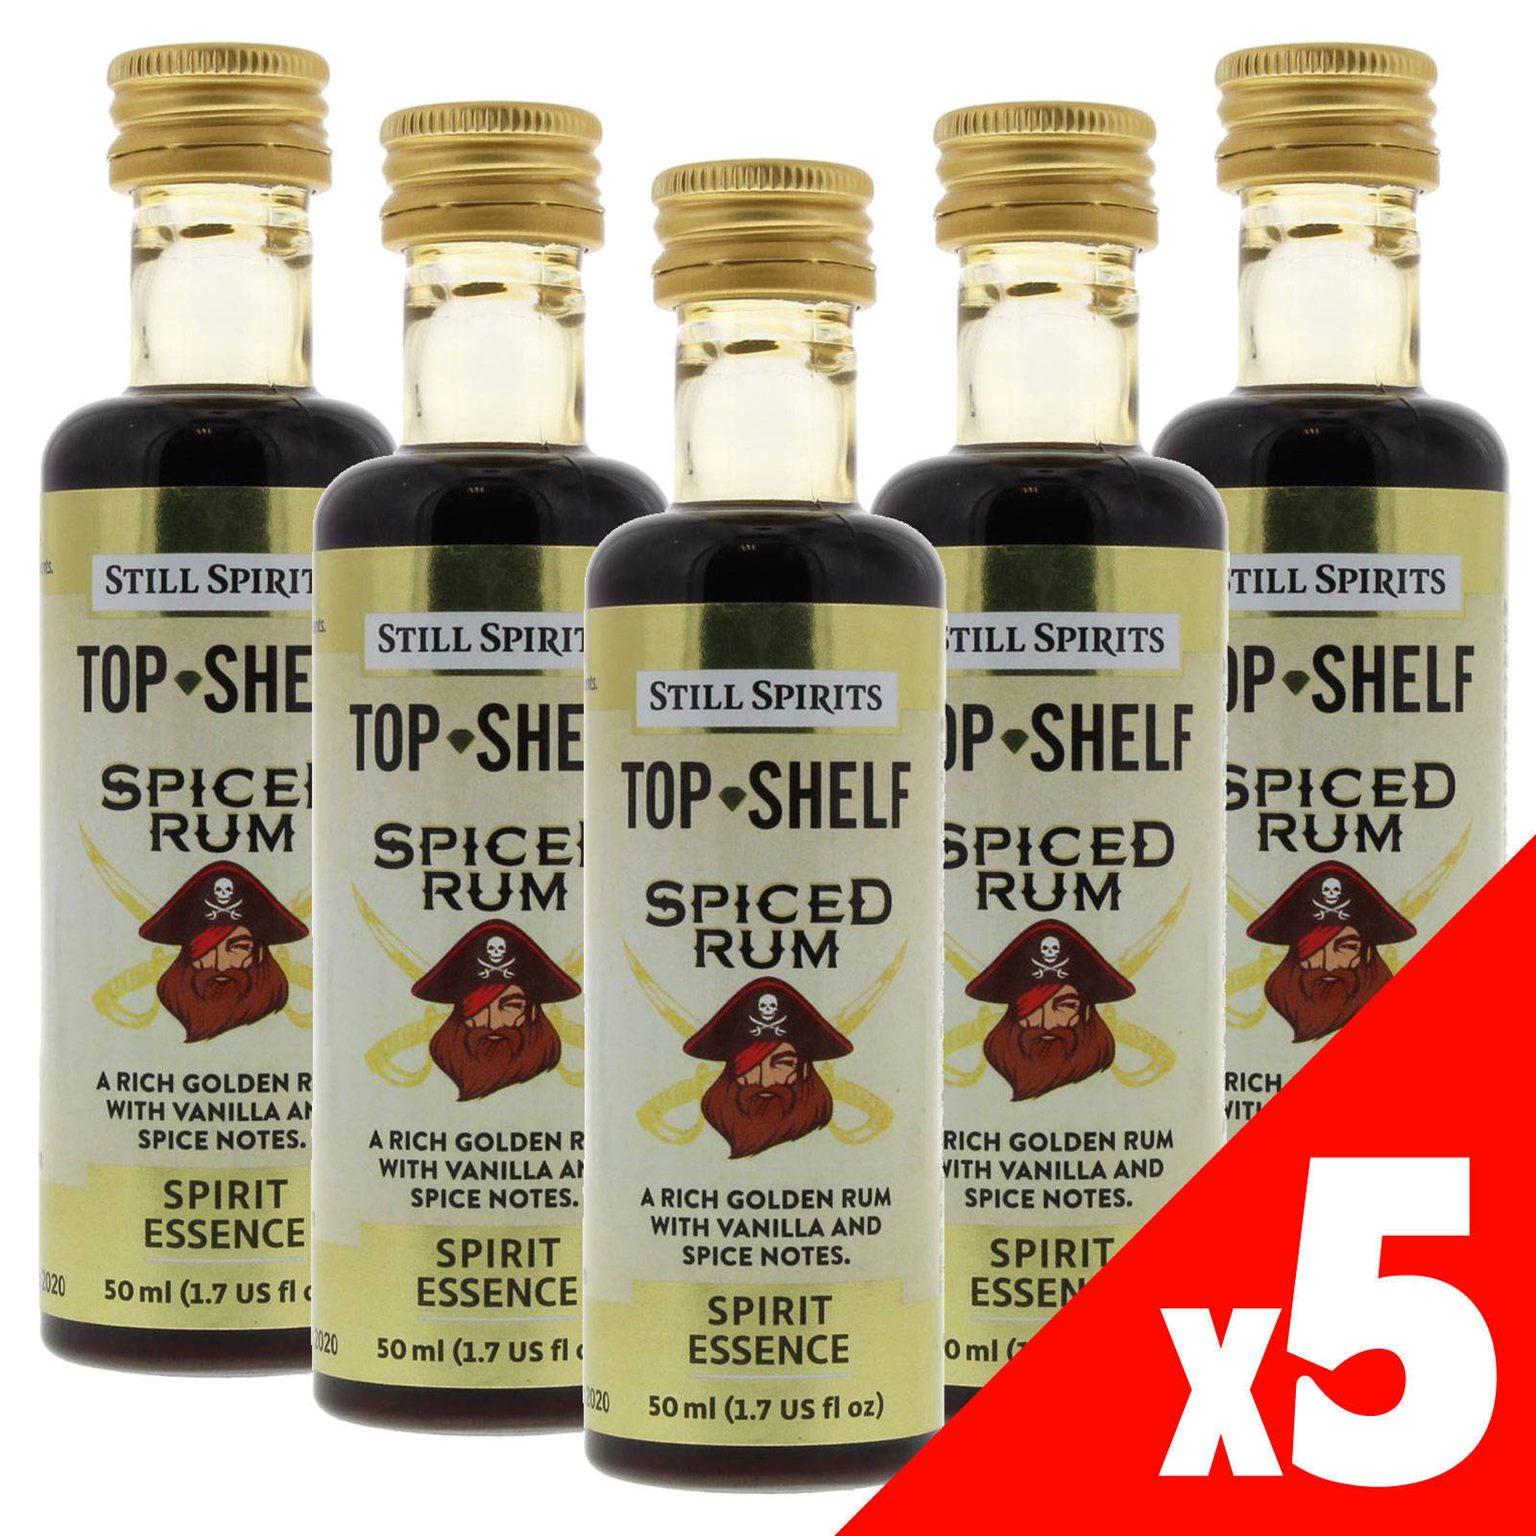 Top Rums 2020.Still Spirits Top Shelf Spiced Rum Essence X5 50ml Spirit Making Home Brew